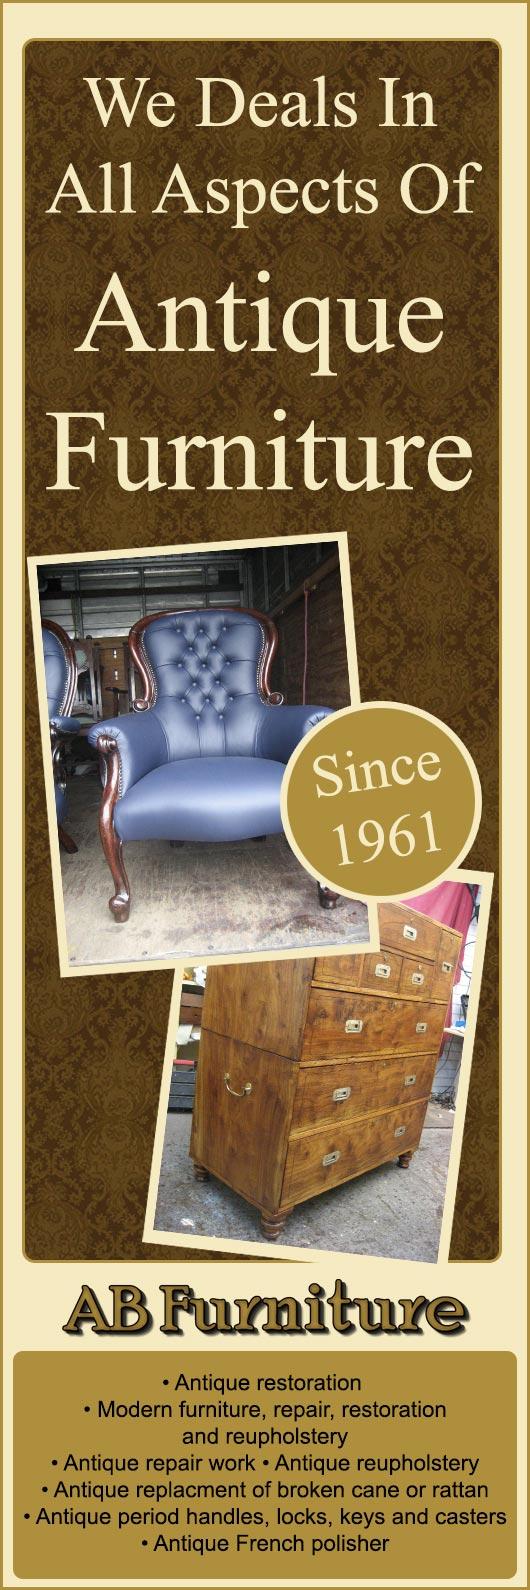 AB Furniture   PromotionAB Furniture   Furniture Restoration   Repairs   630 Glenhuntly Rd  . Rattan Chair Repairs Brisbane. Home Design Ideas